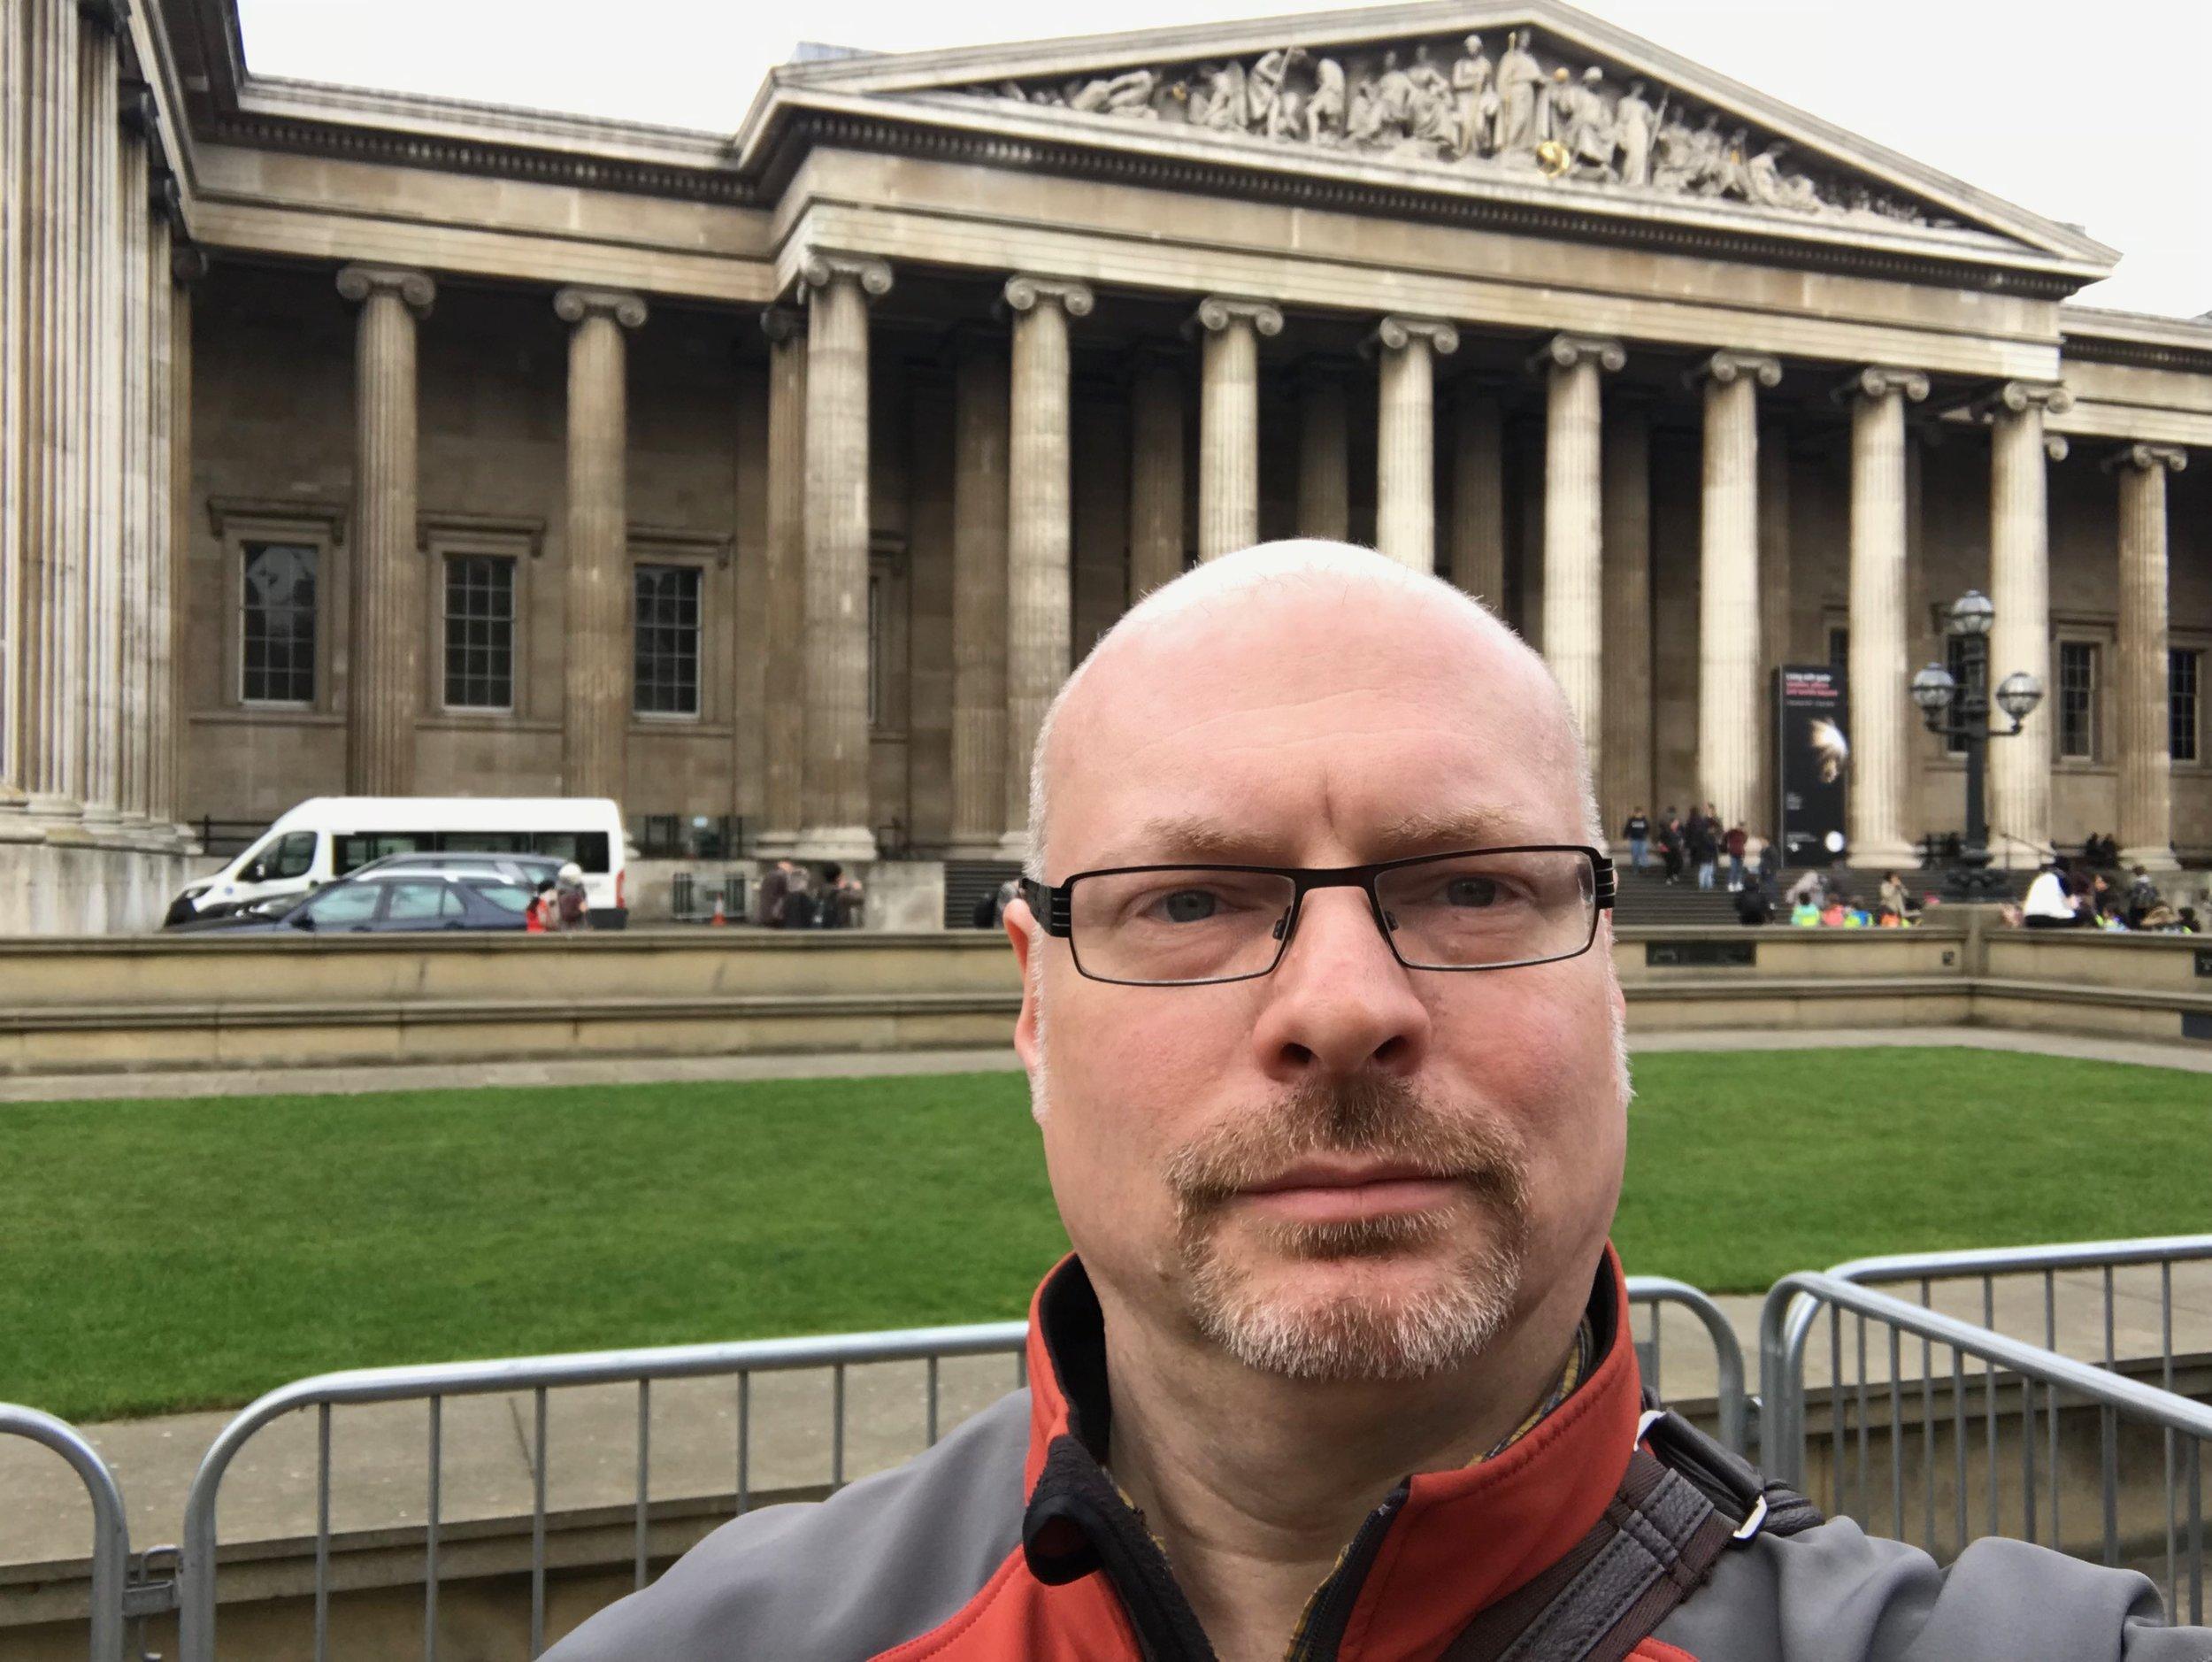 Paul at the British Museum - Paul Greene.jpg